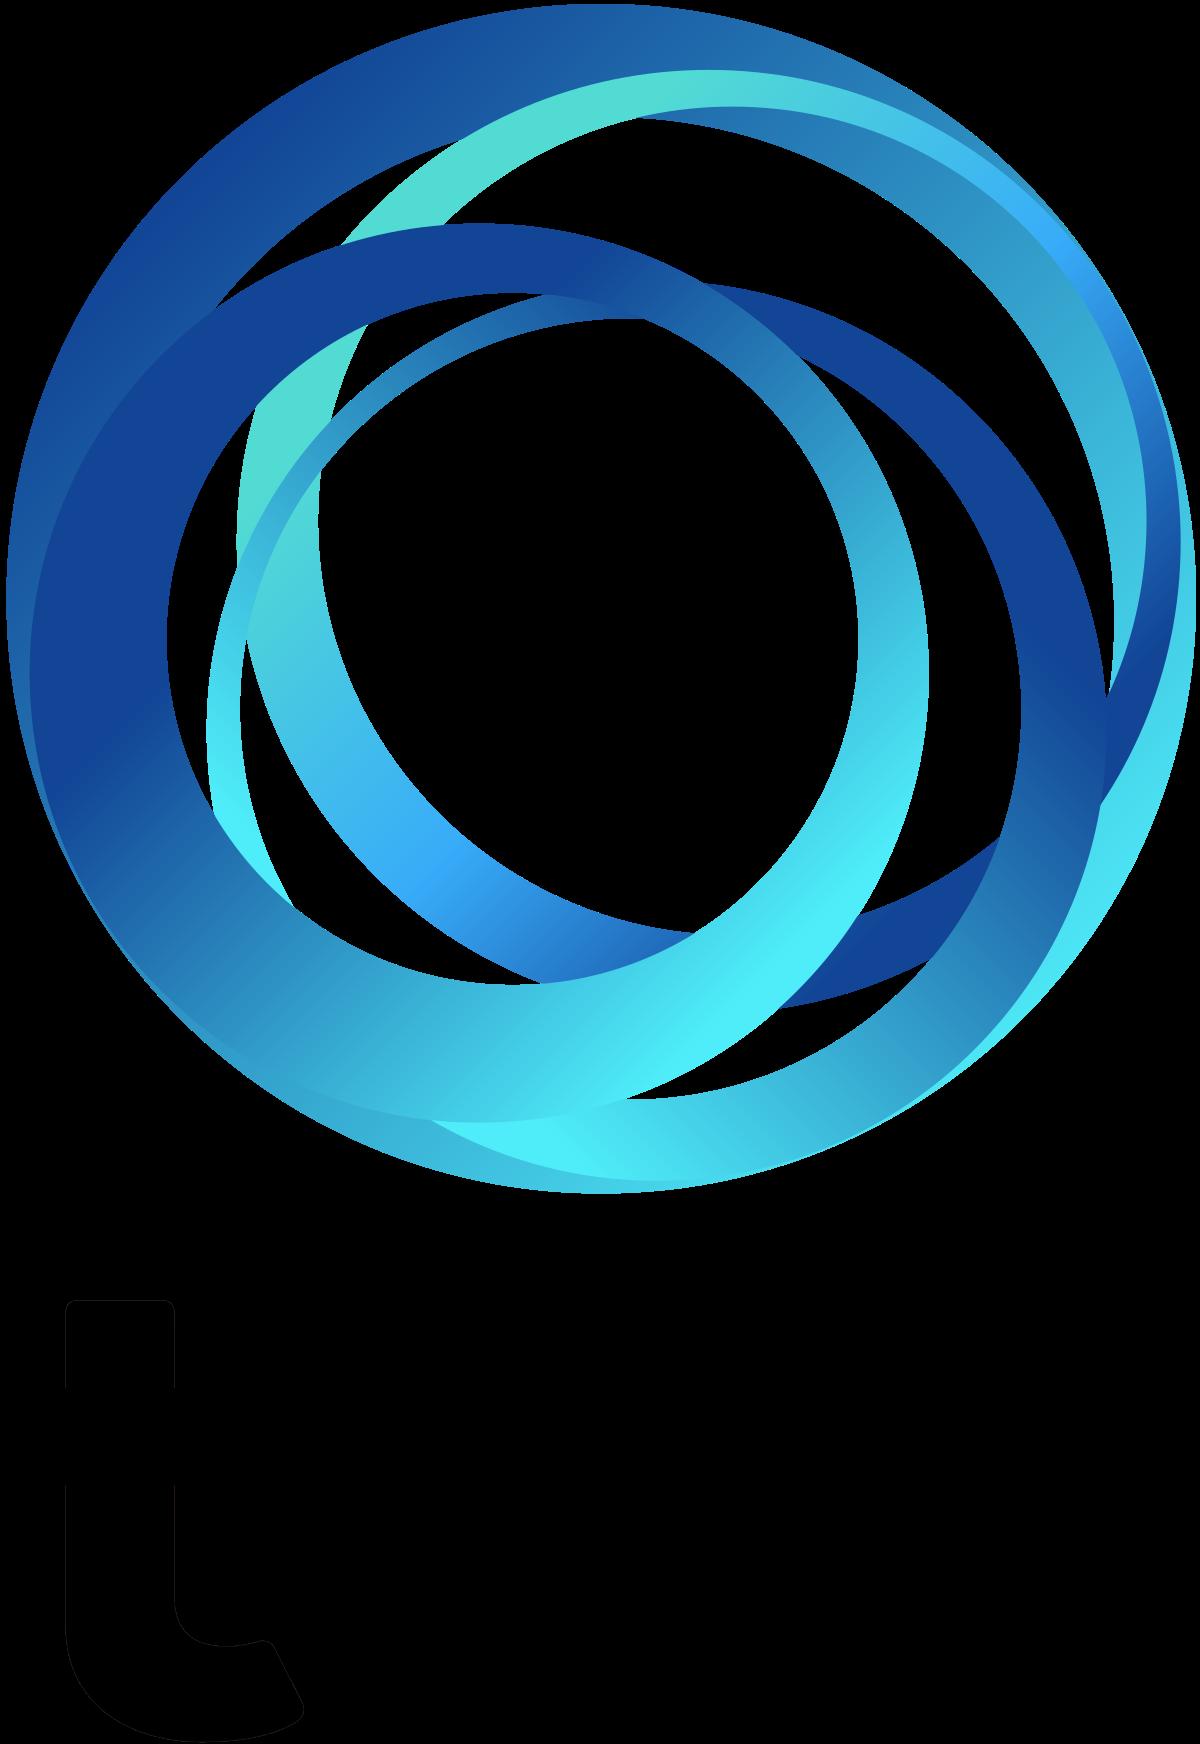 Tvnz wikipedia . News clipart tv broadcasting